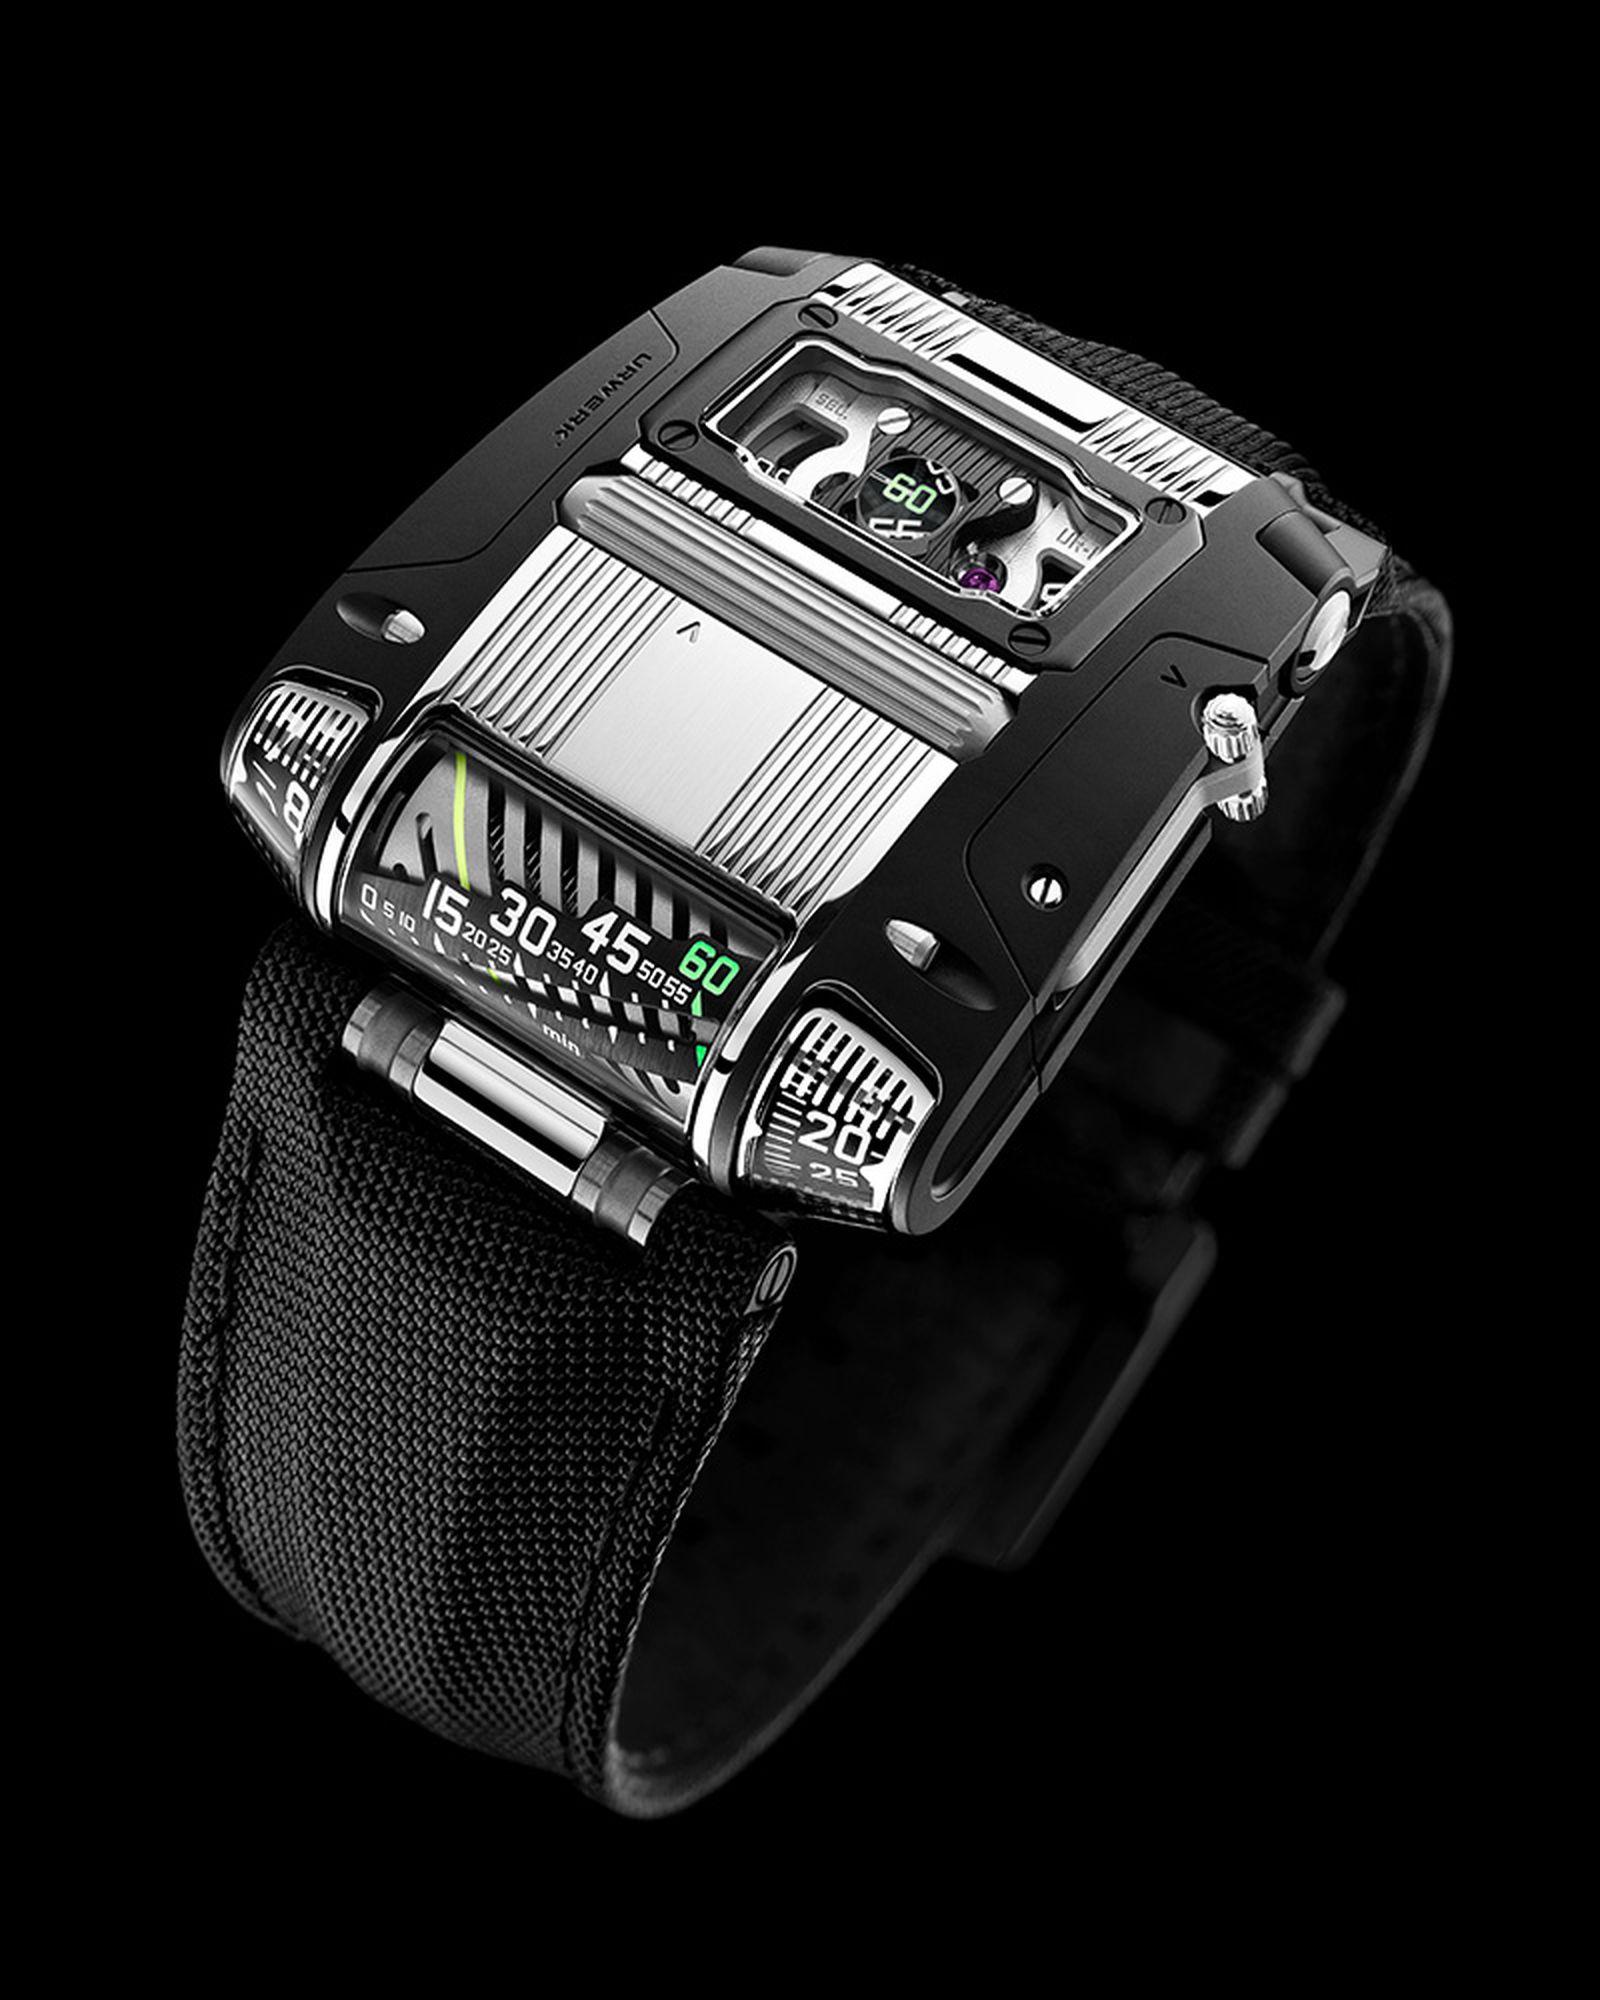 Urwerk UR-111C in steel and black PVD steel with jumping hours, retrograde linear minutes, digital minutes, digital seconds. $130,000.